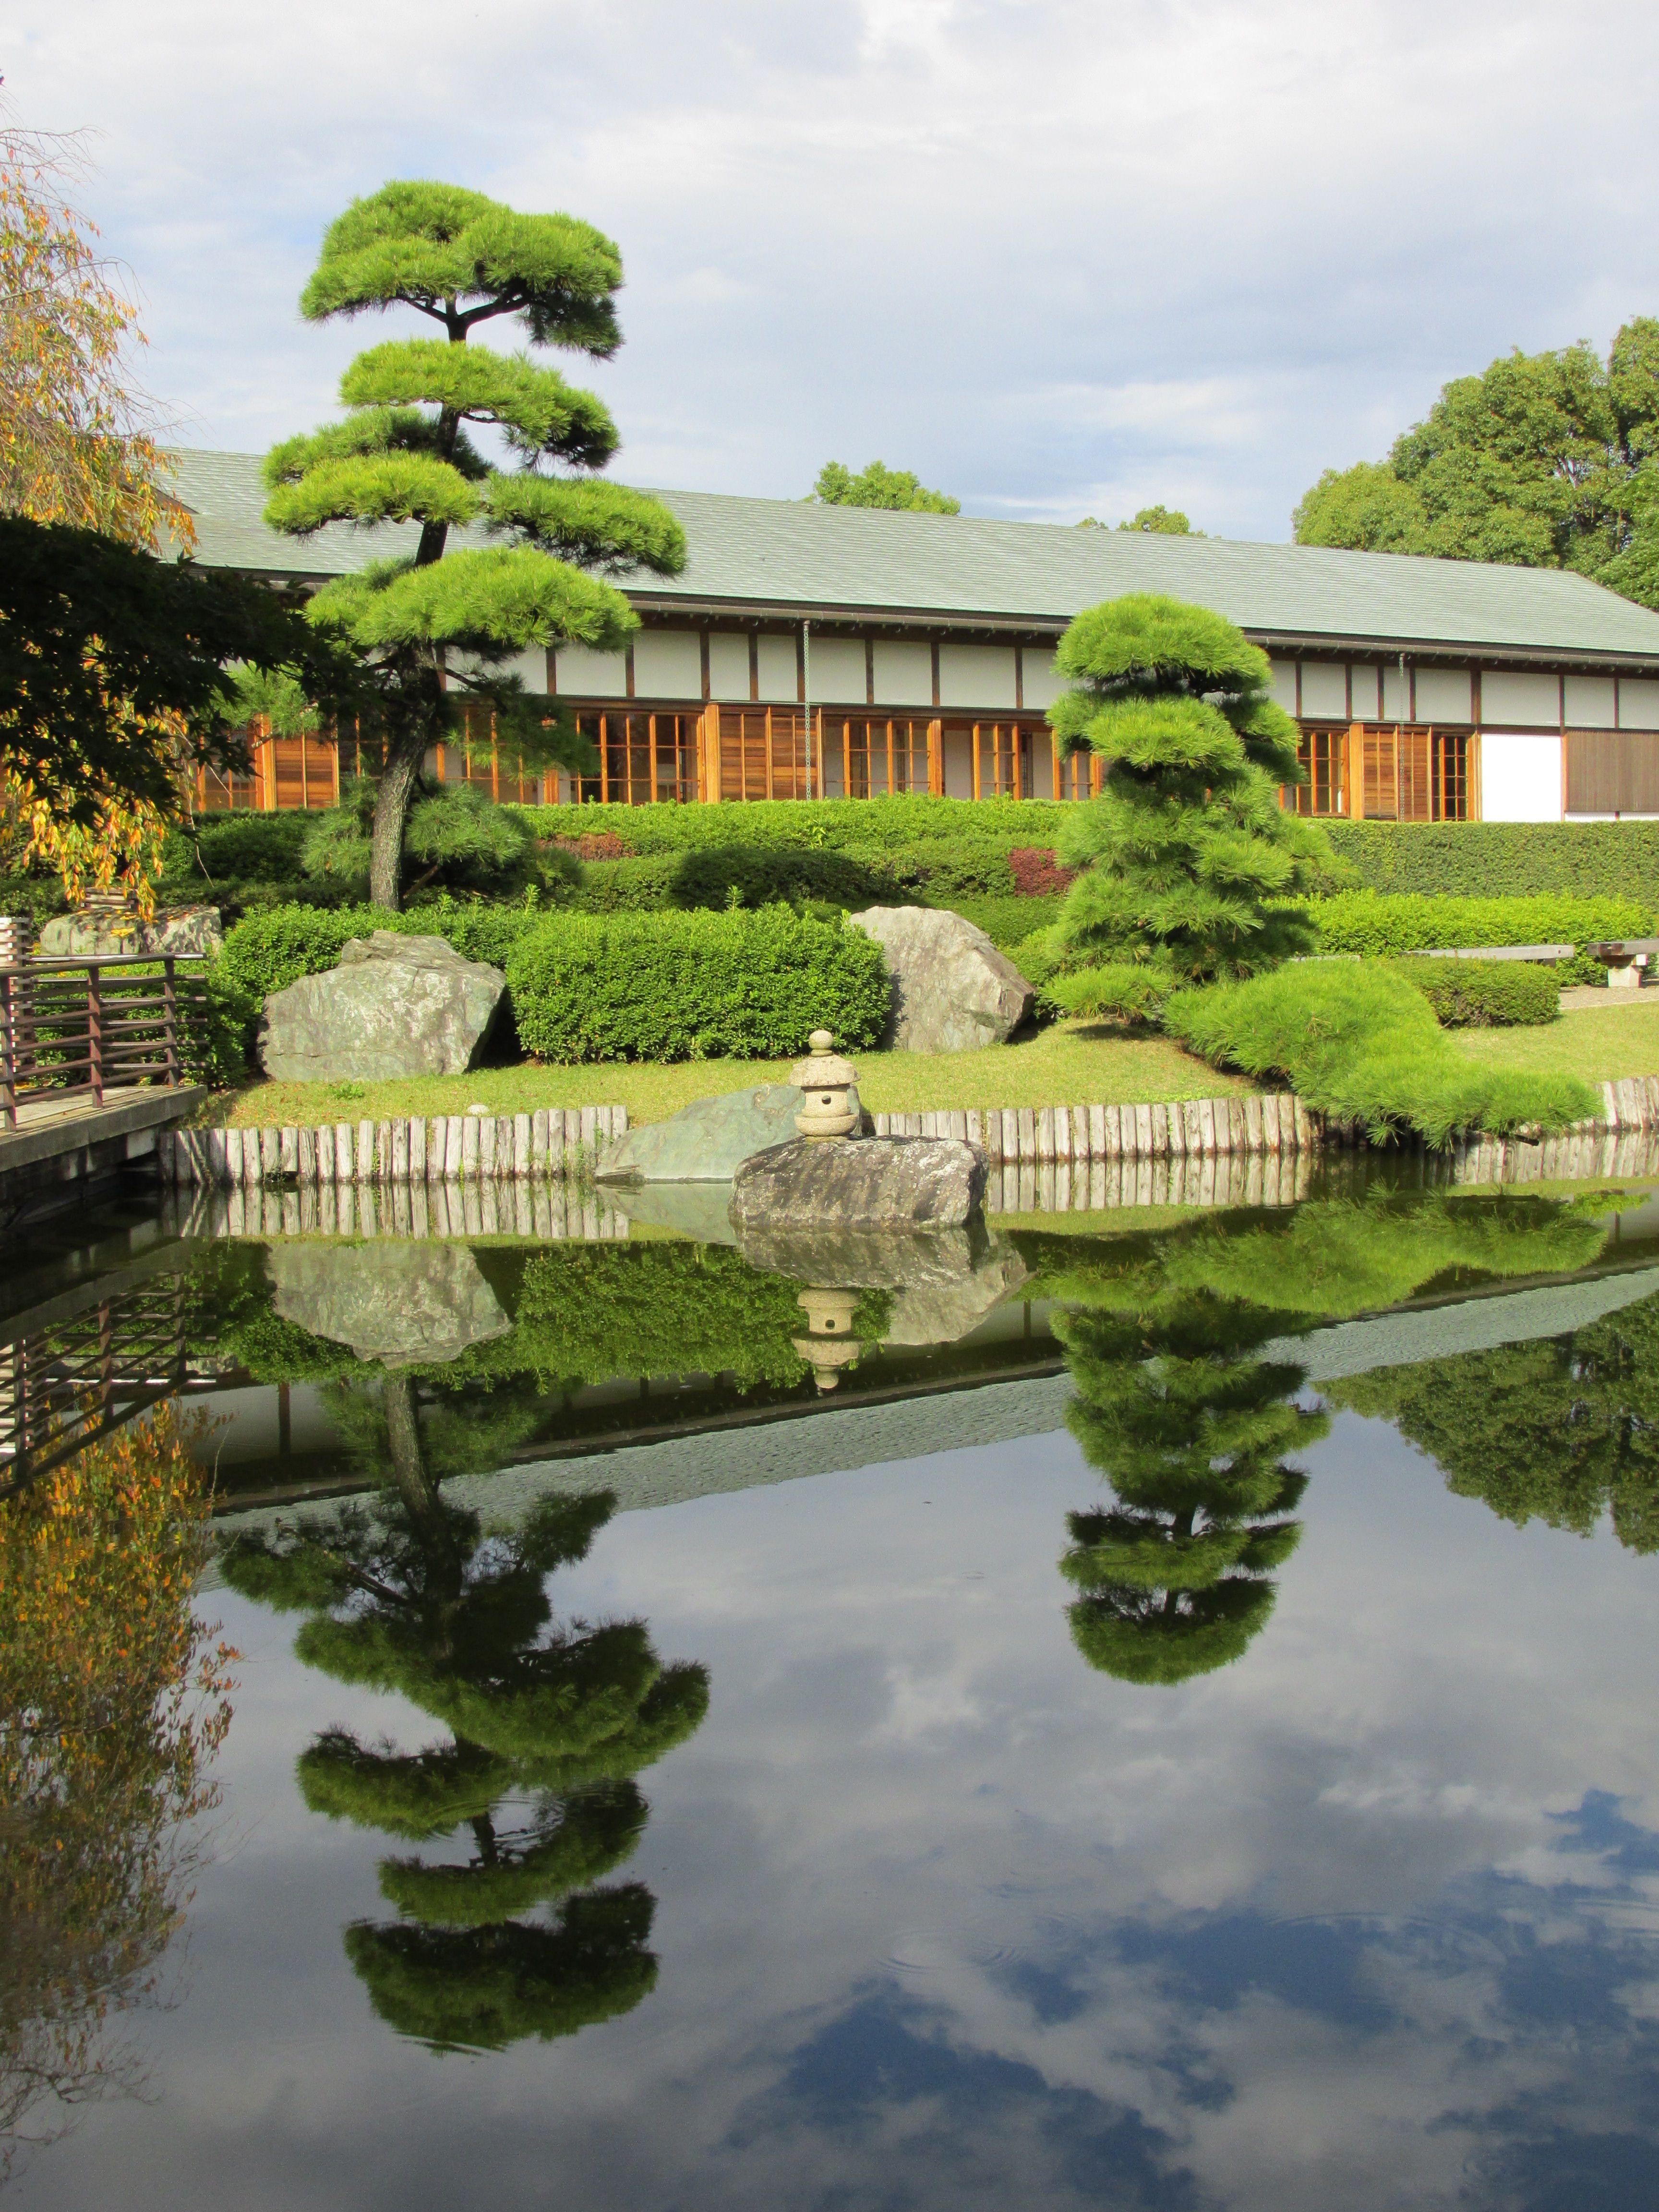 A Japanese Garden (Hanadaen) In Koshigaia, Saitama Inside This Building